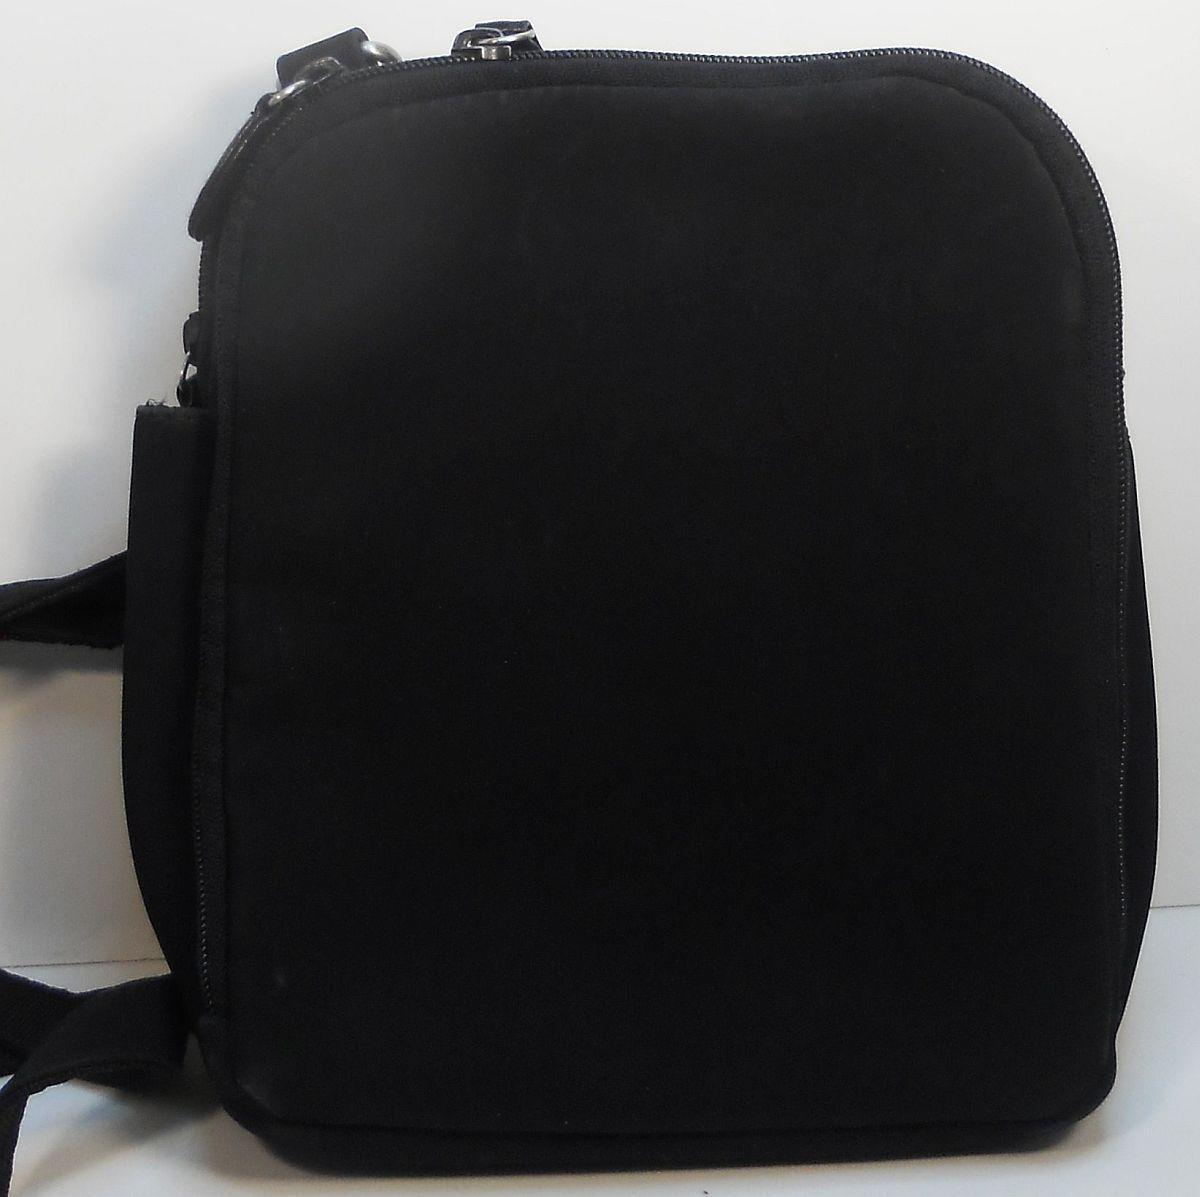 Suvelle Hobo Travel Everyday Shoulder Bag 3 Colors Day ... |Hobo Travel